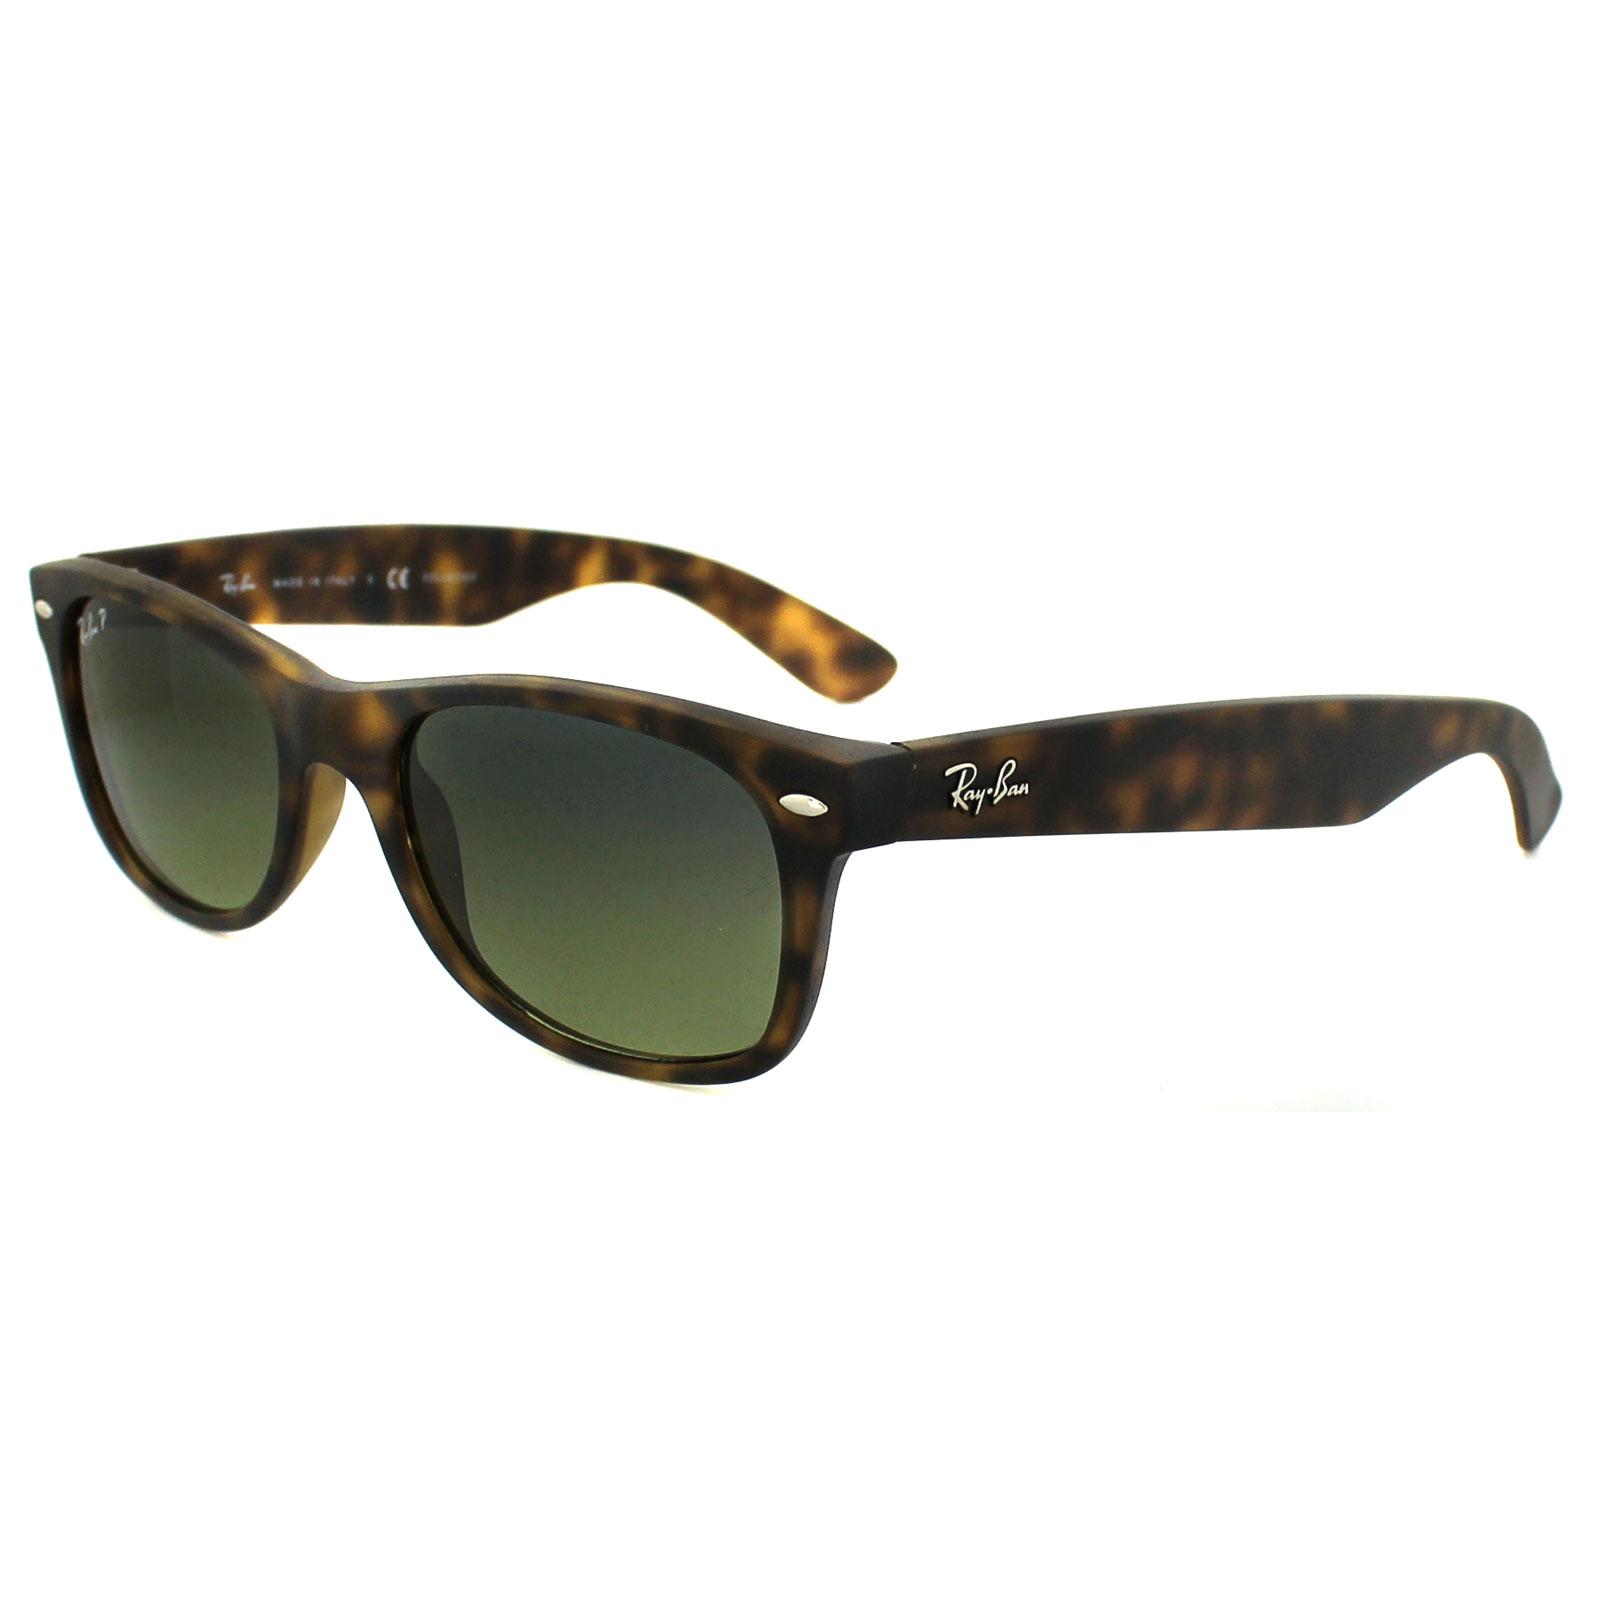 6df41e6153 CENTINELA Gafas de sol de Ray-Ban Wayfarer 2132 894/76 nueva la Habana mate